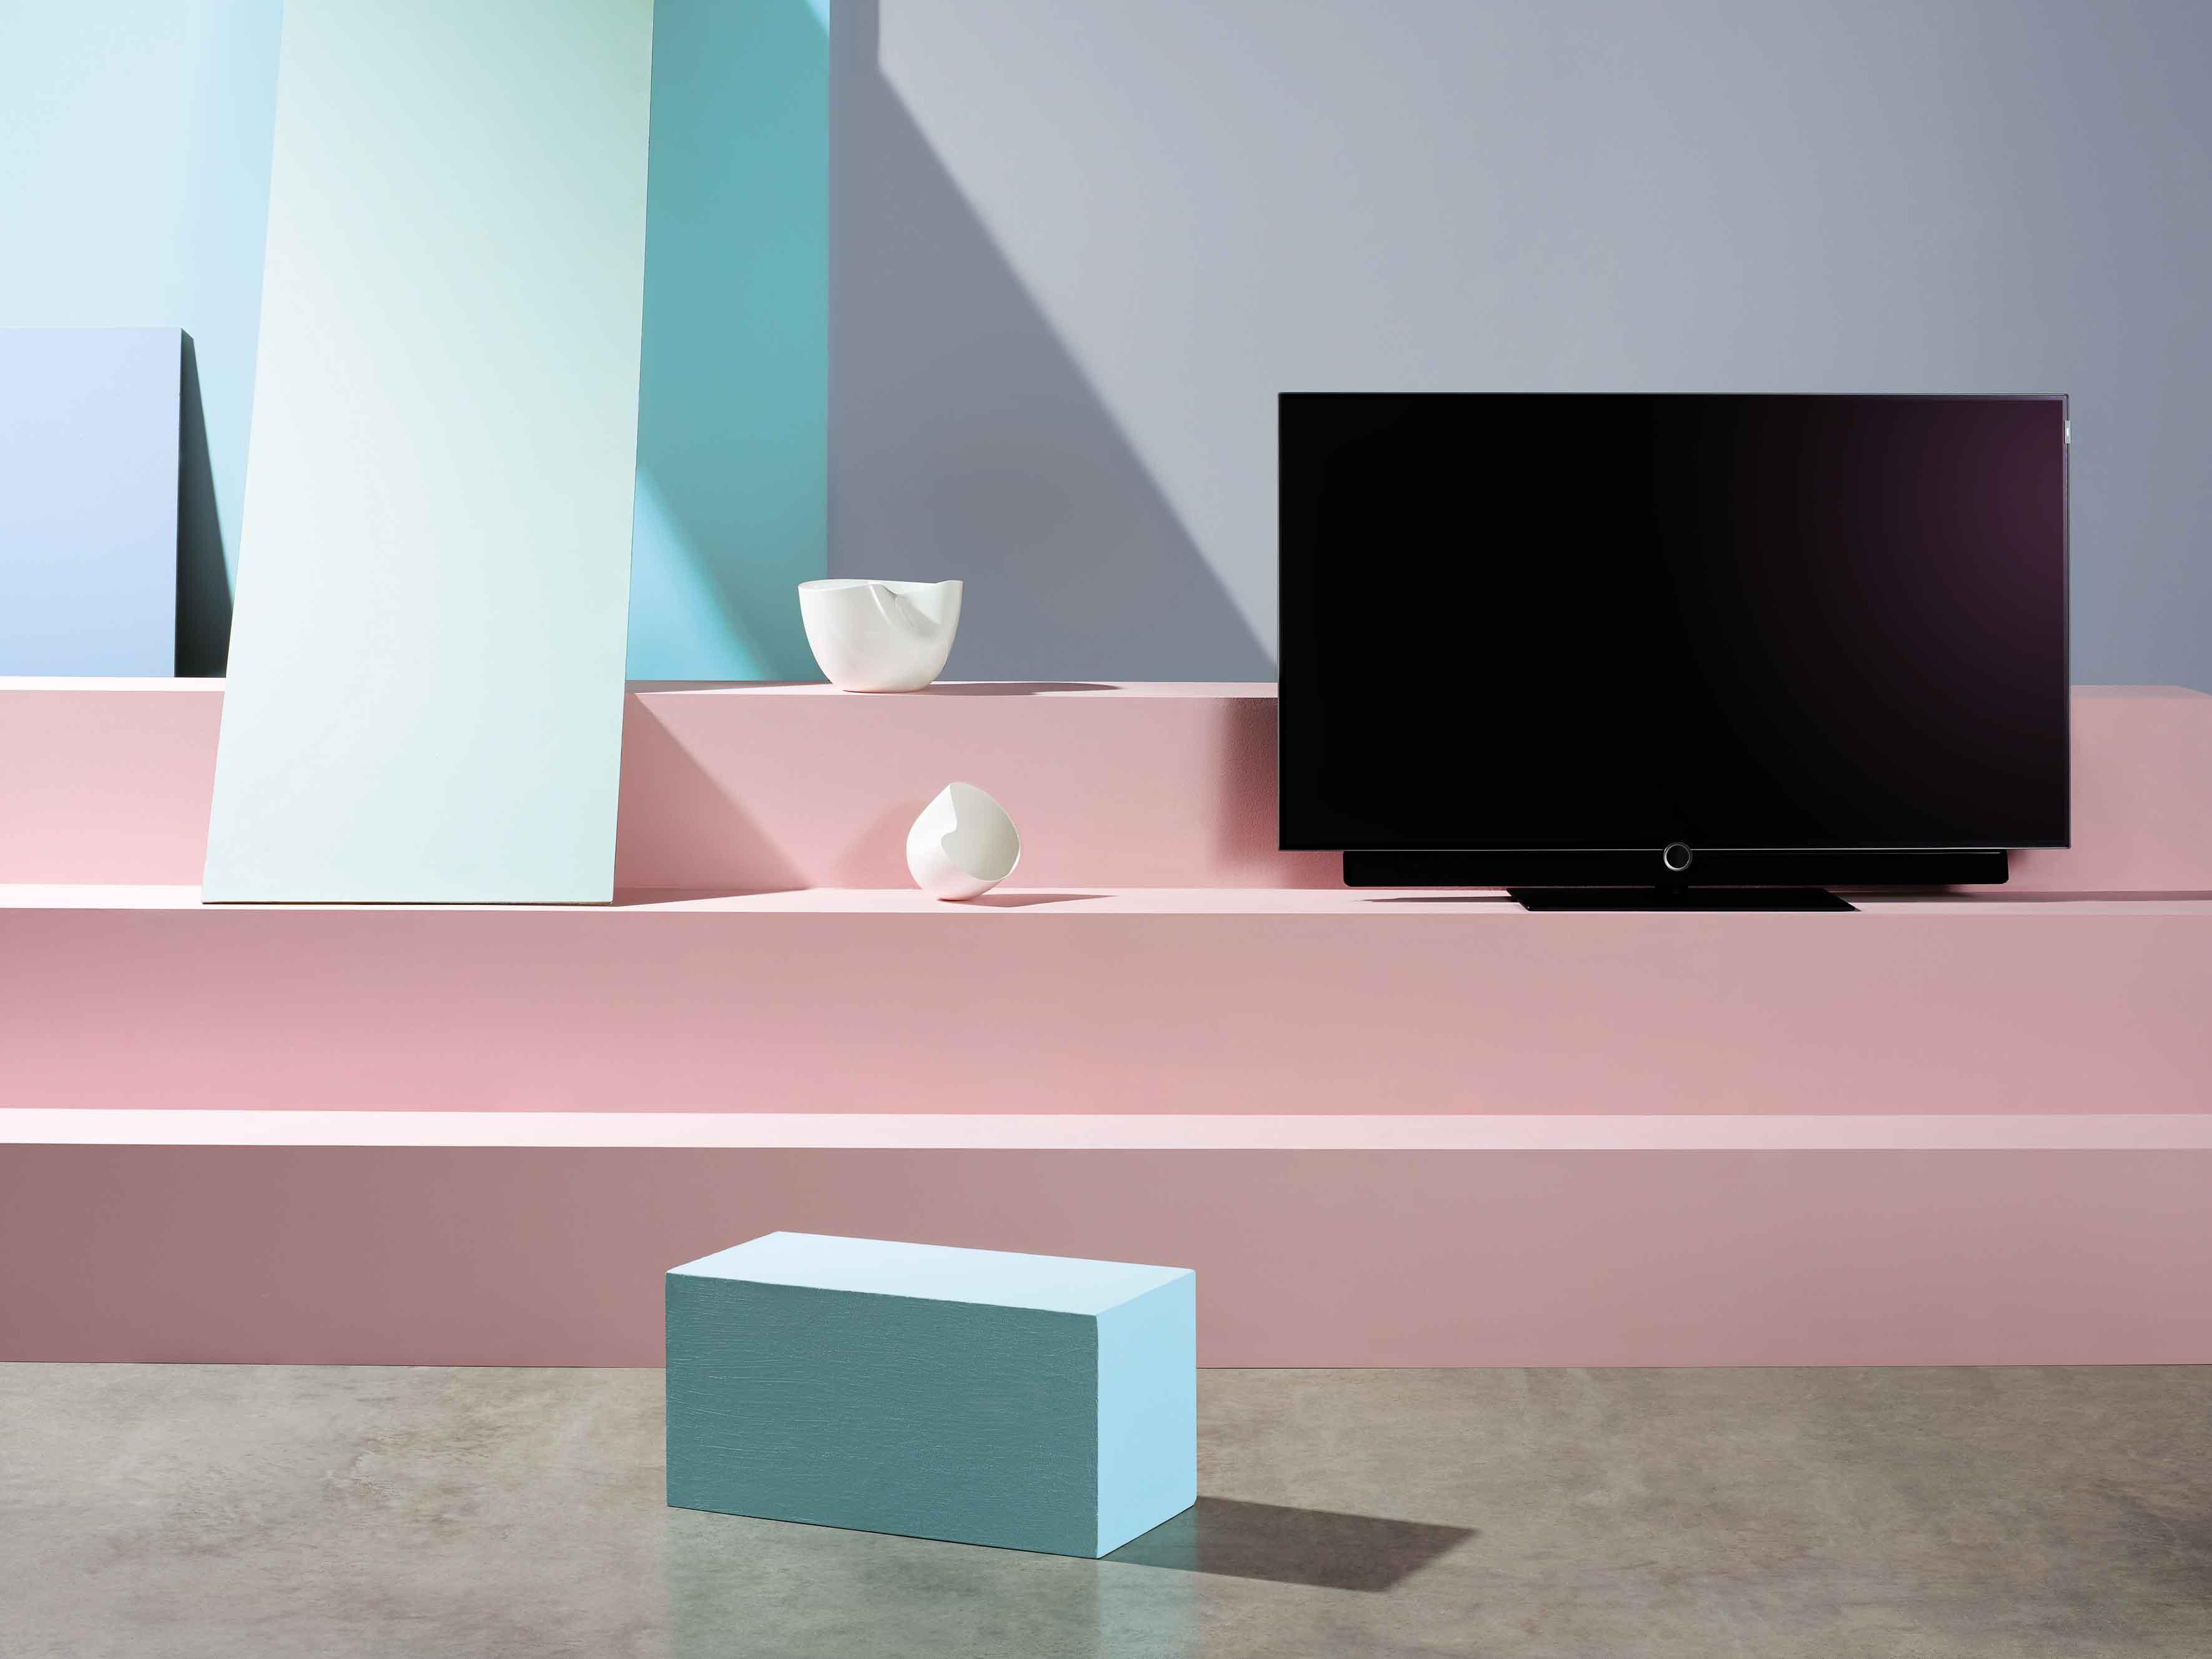 koenig ascona bild 4 pink room